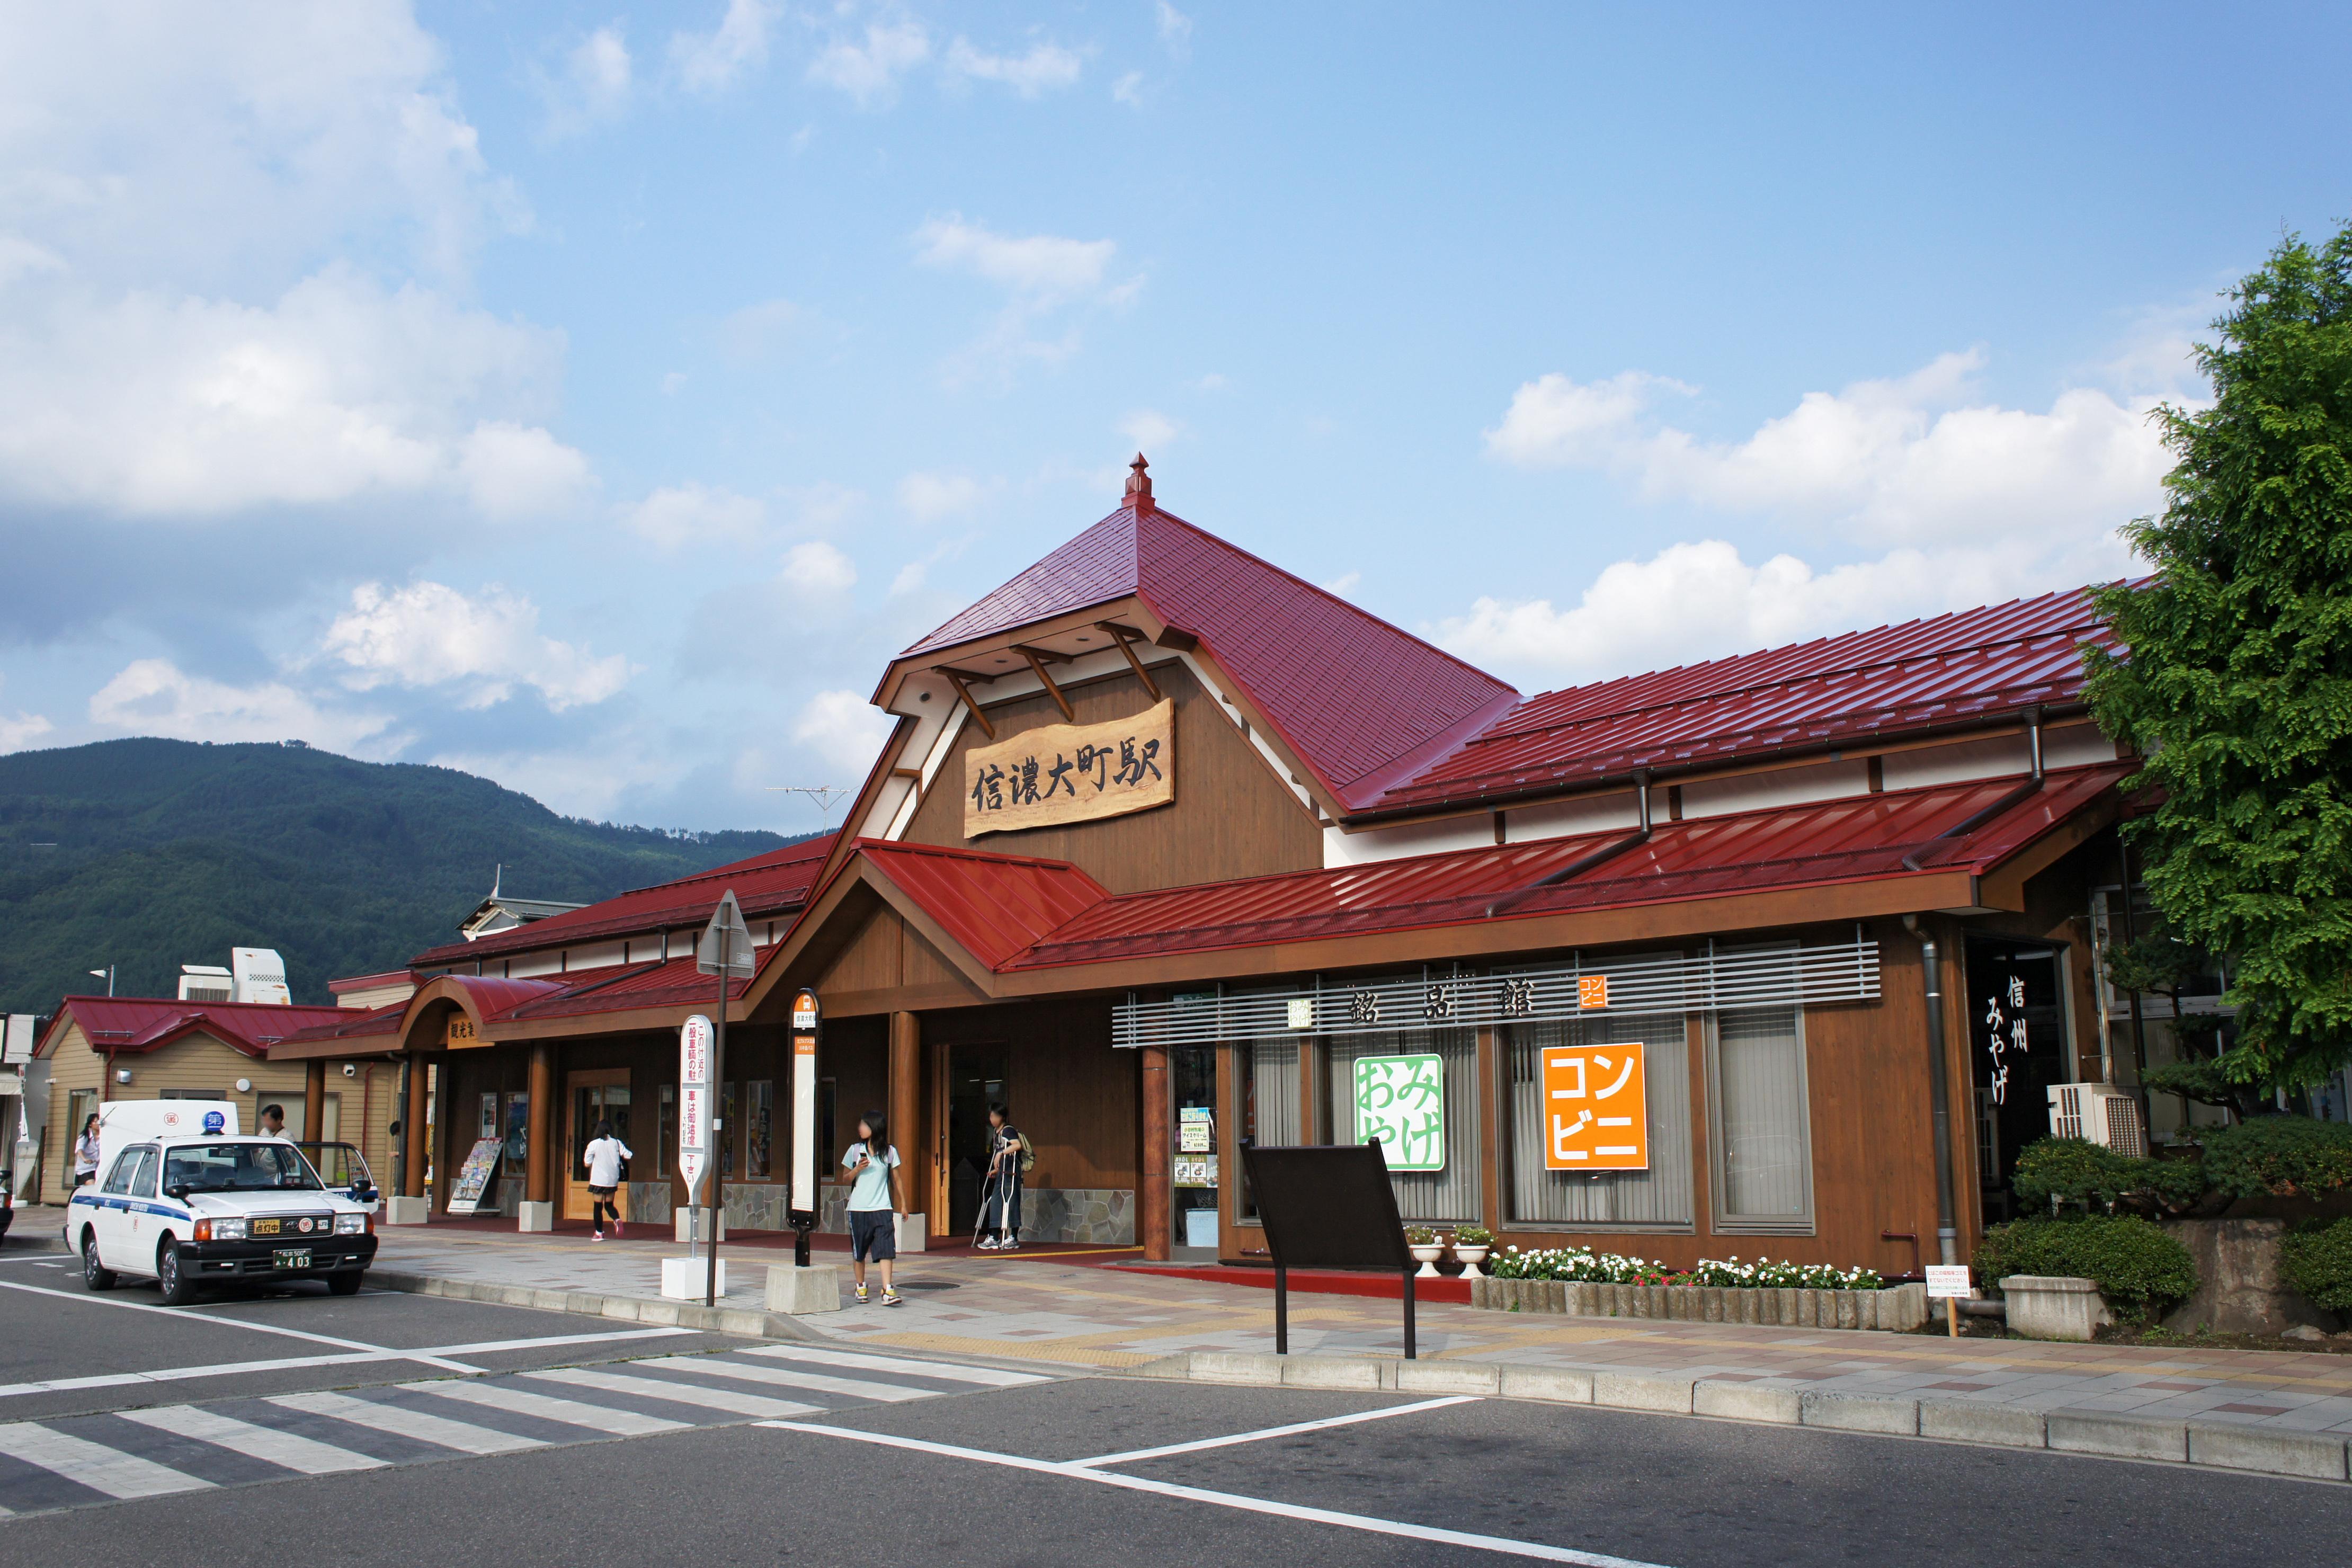 https://upload.wikimedia.org/wikipedia/commons/8/8b/Shinano-Omachi_Station09n4440.jpg